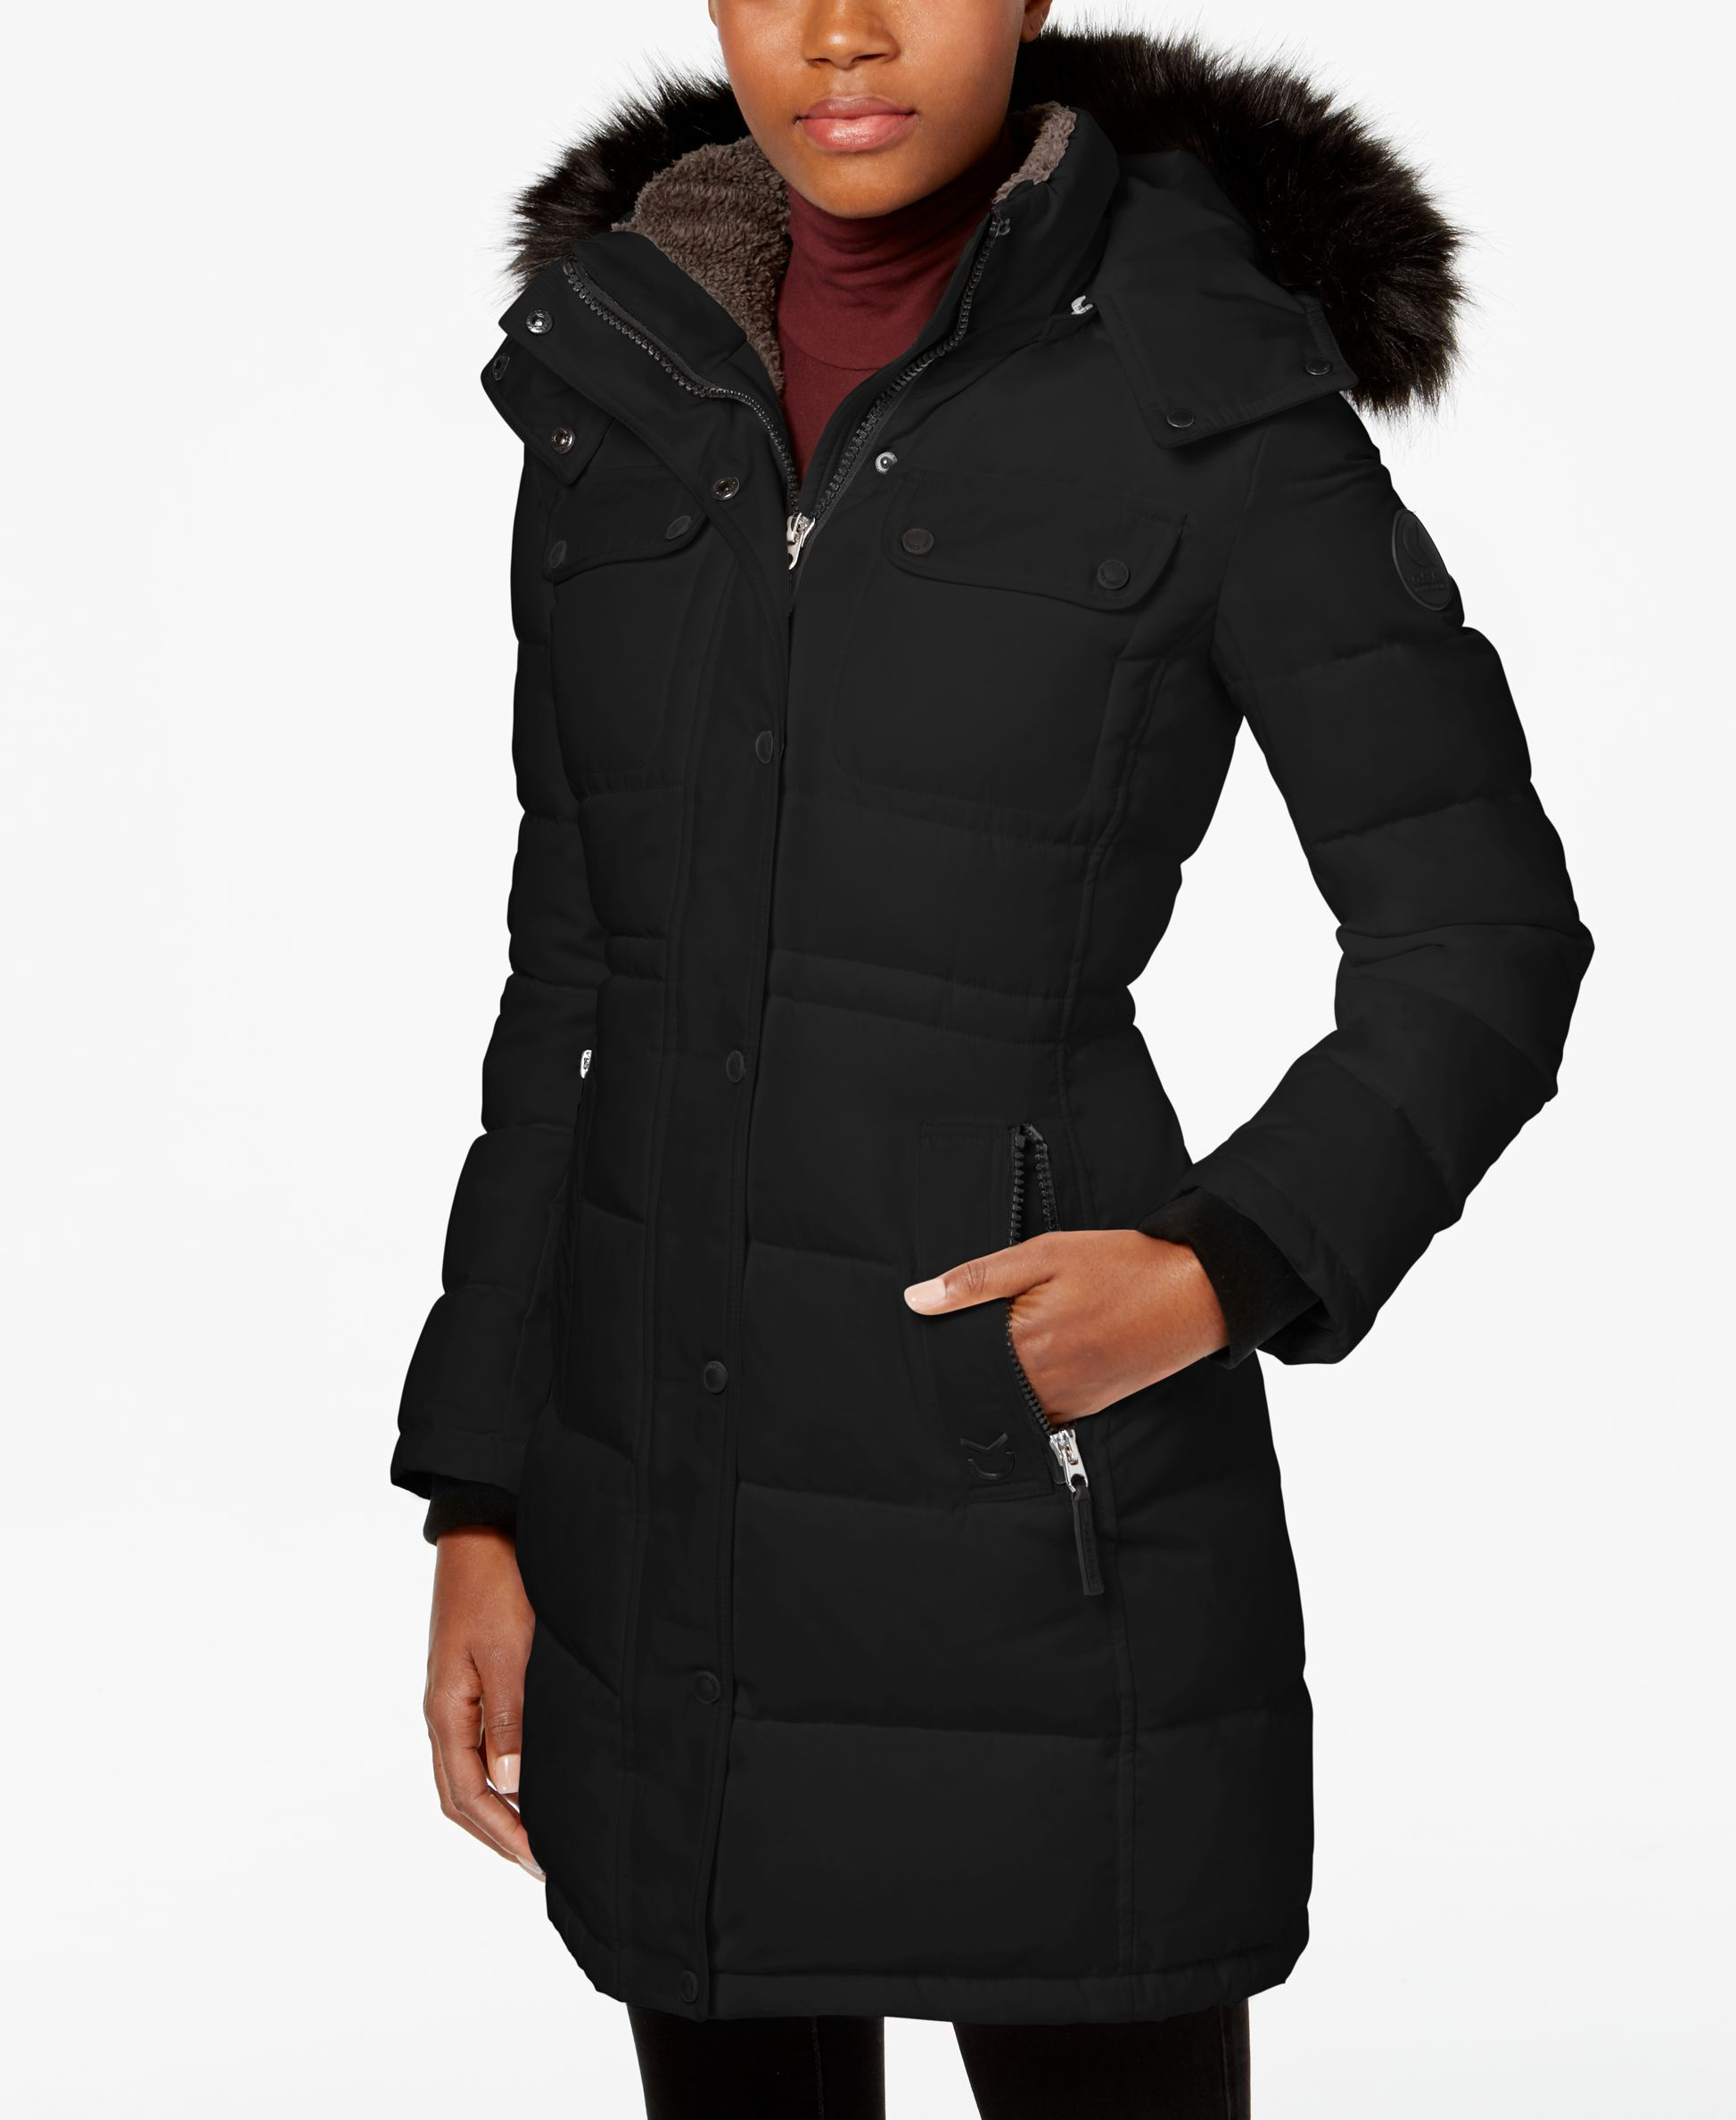 Calvin Klein Faux Fur Trim Quilted Puffer Coat Puffer Coat Fashion Modest Wardrobe [ 2378 x 1947 Pixel ]